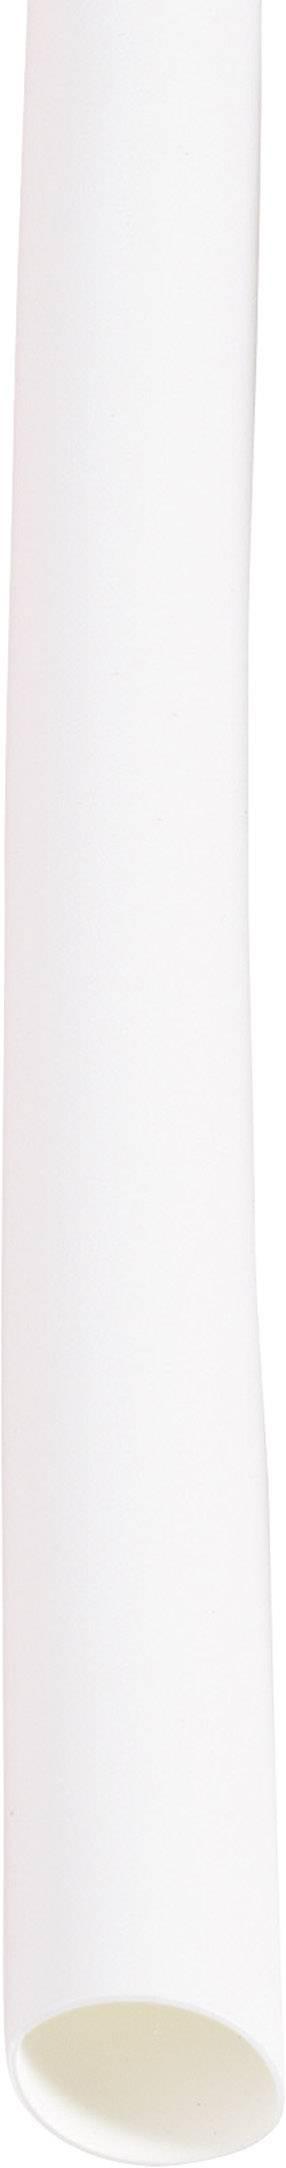 Smršťovací bužírka bez lepidla DSG Canusa 2890012902 2:1, -55 až +135 °C, 1.20 mm, bílá, metrové zboží